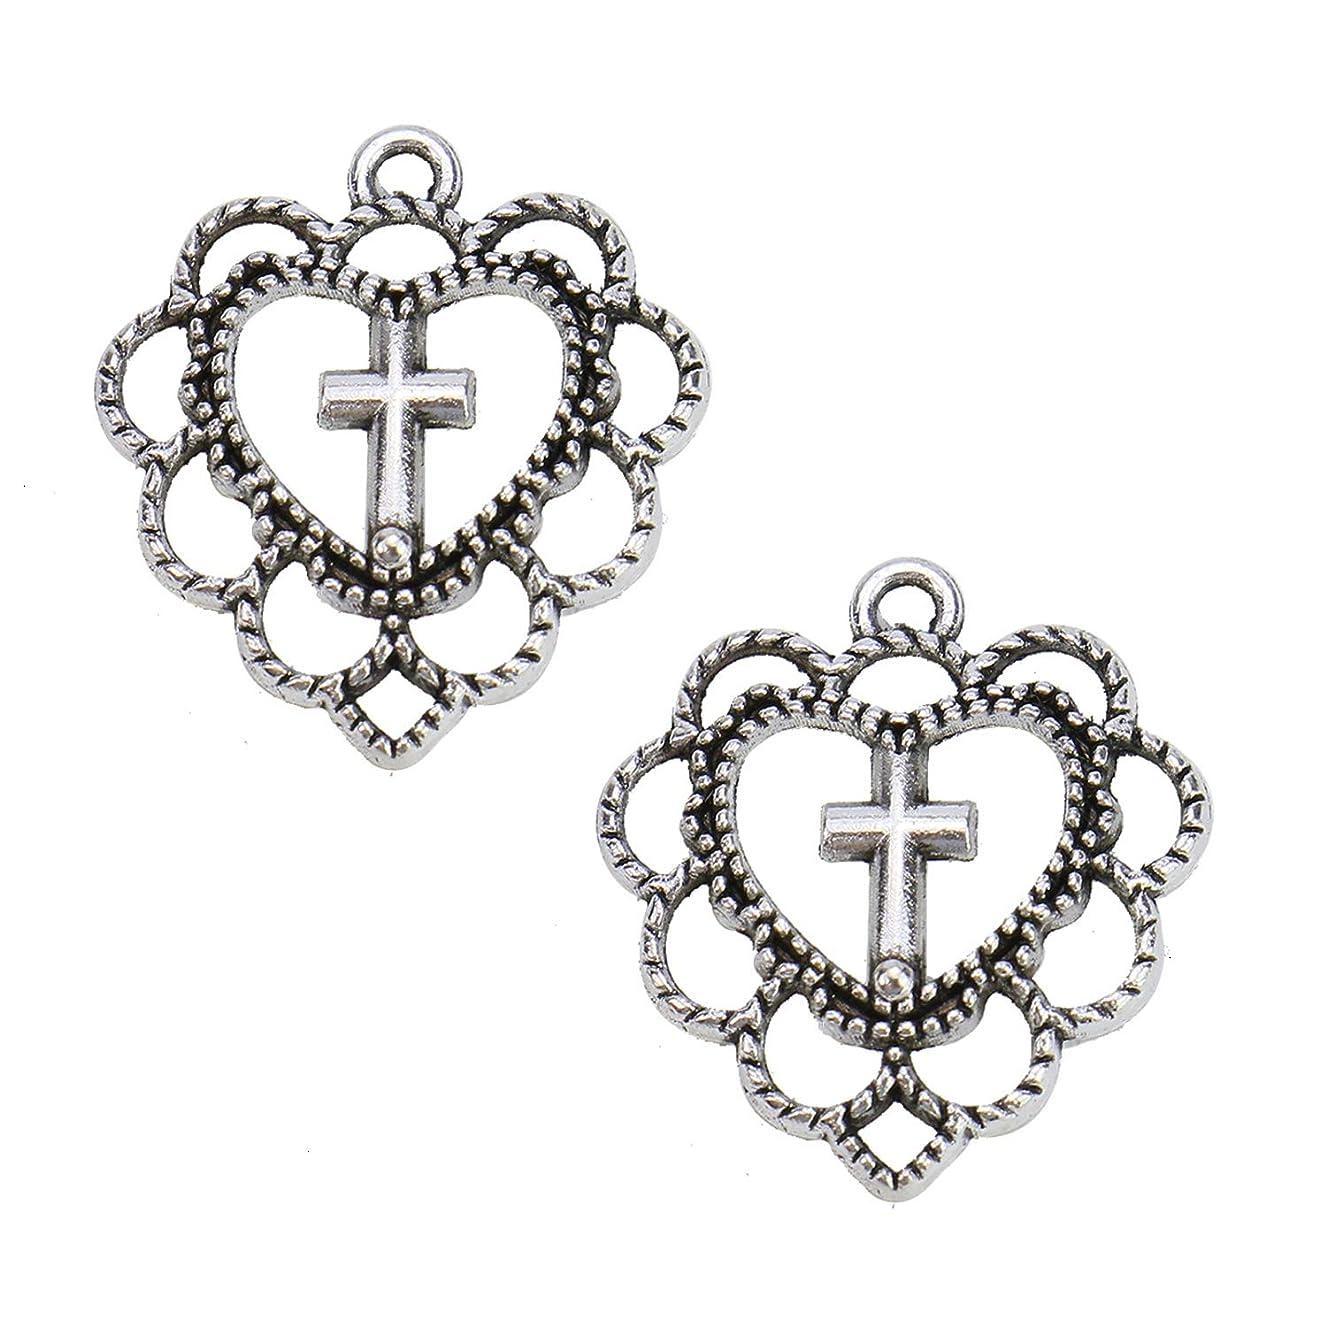 Monrocco 60 Pcs 20x22mm Silver Love Heart Cross Charms Christian Charm Pendant for Bracelets Jewelry Making